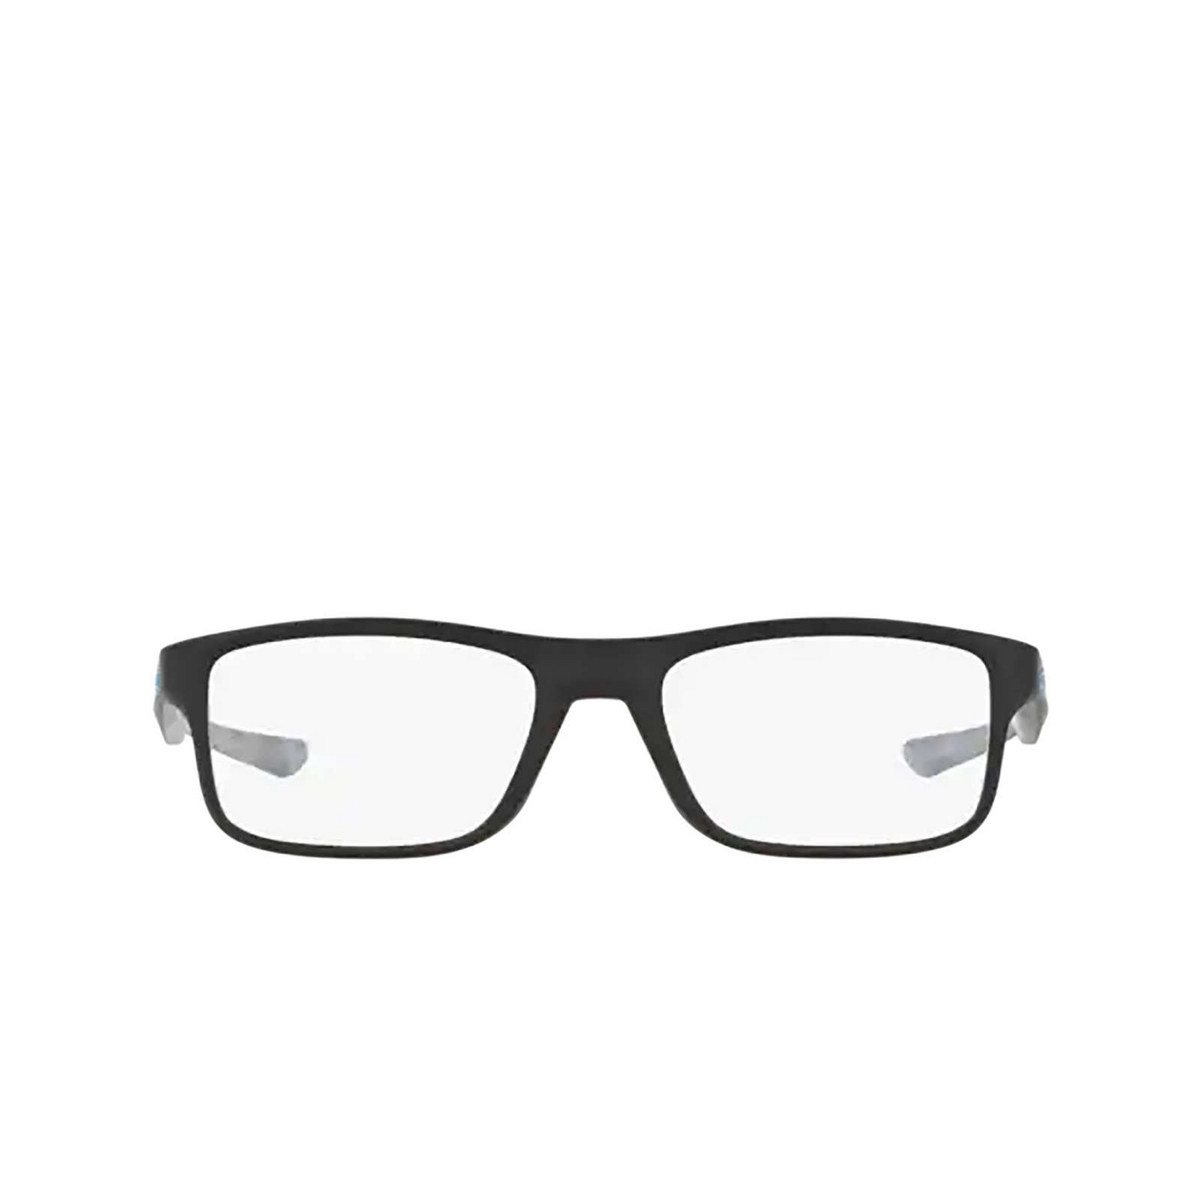 Oakley® Rectangle Eyeglasses: Plank 2.0 OX8081 color Satin Black 808101 - front view.